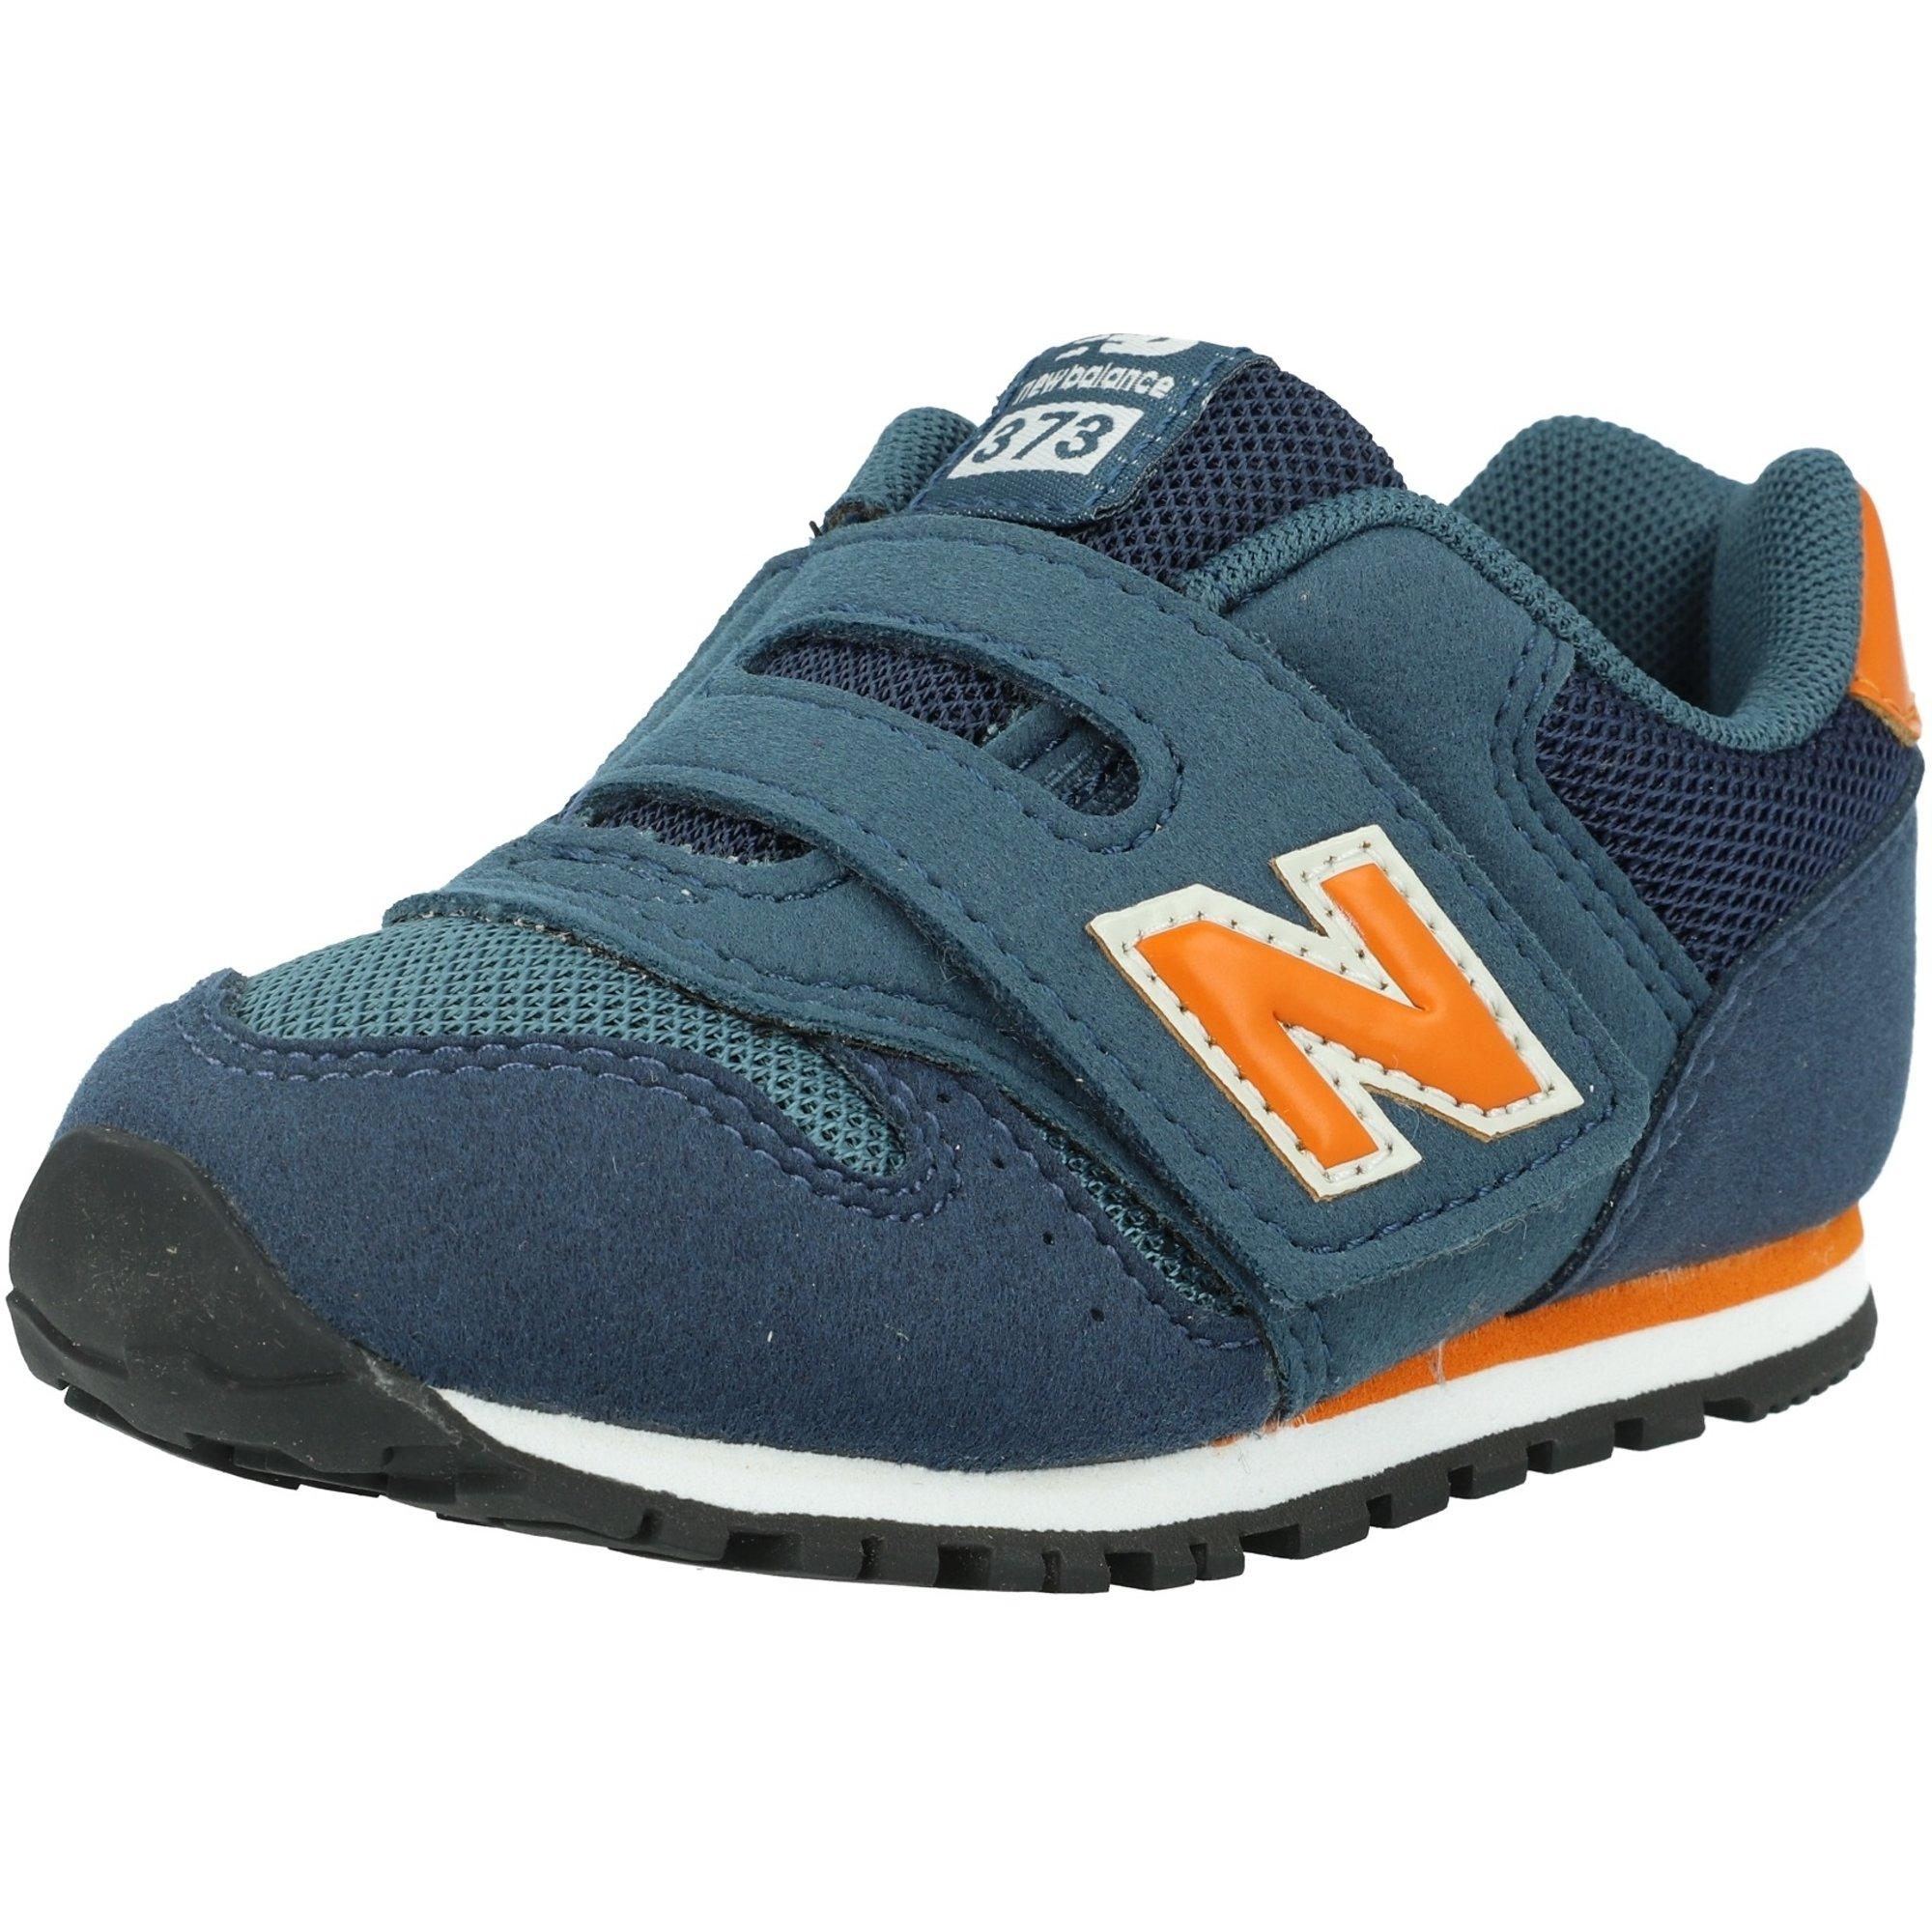 New Balance 373 Stone Blue/Vintage Orange Suede Infant